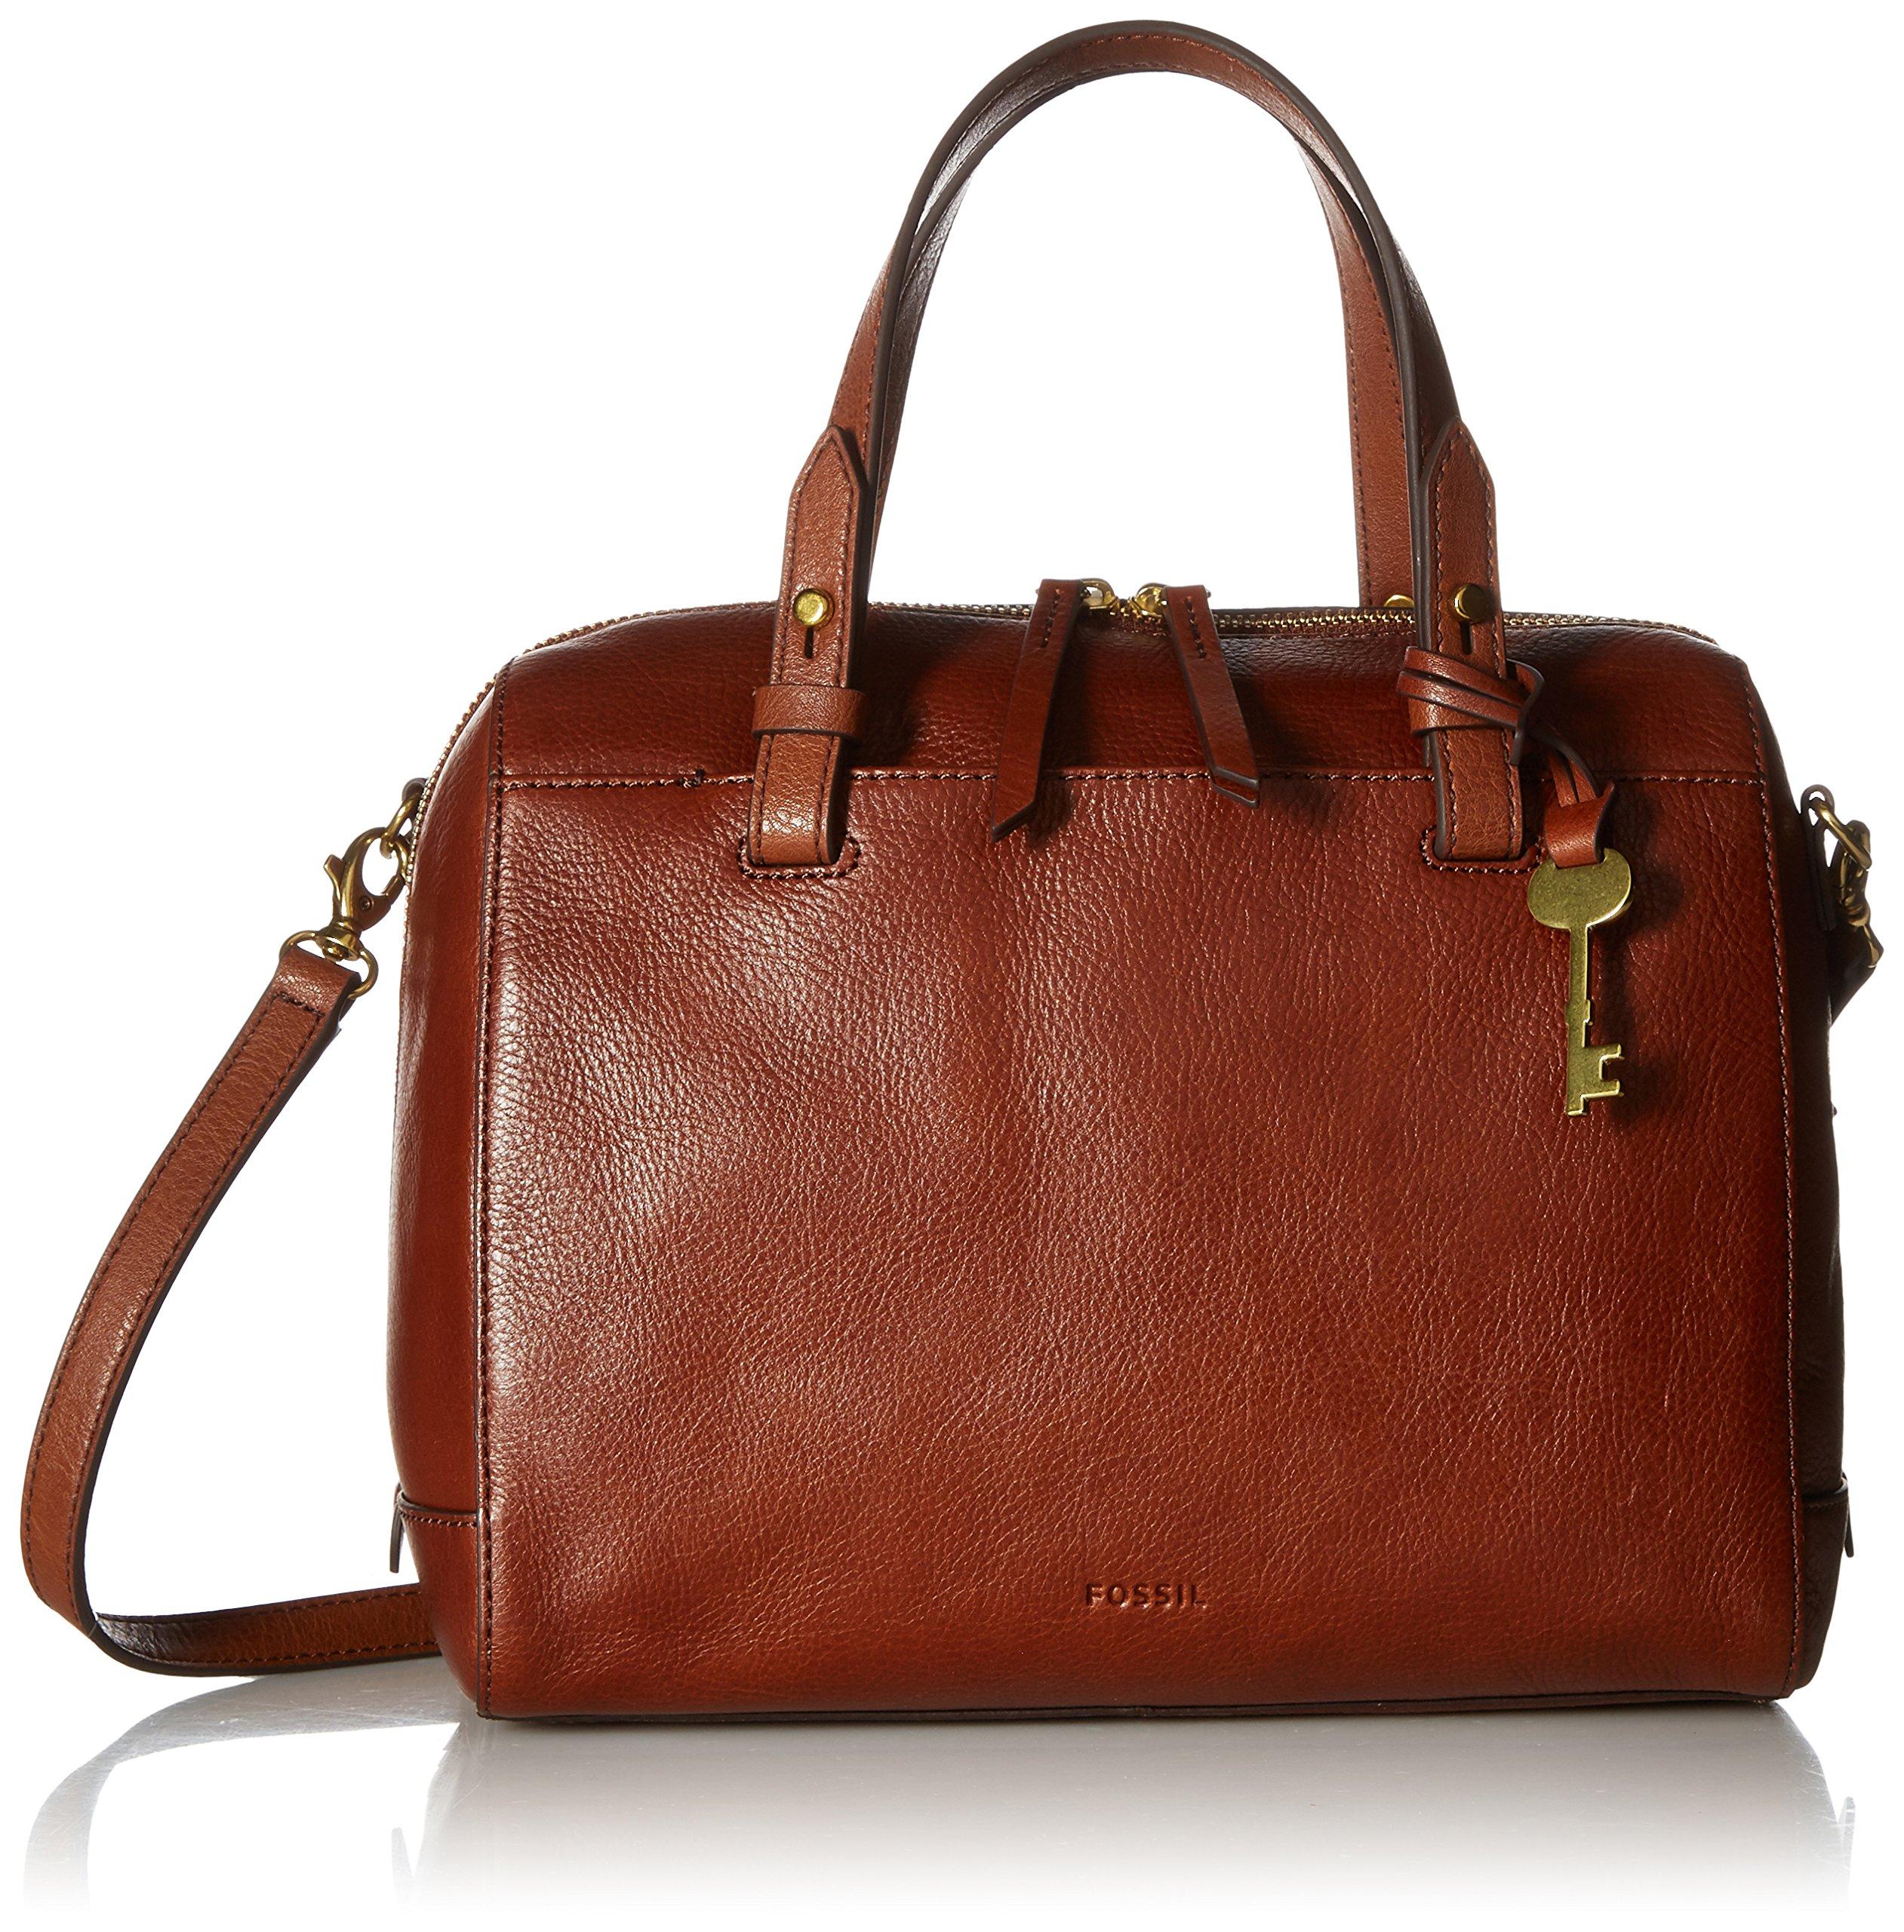 Fossil Rachel Satchel Handbag, medium brown